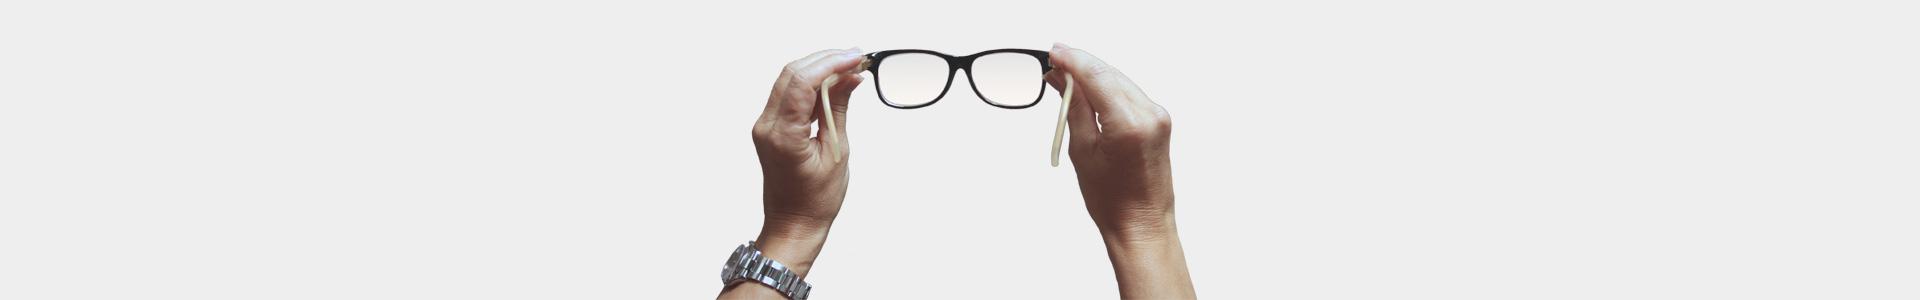 Auge im Alter Sehhilfe